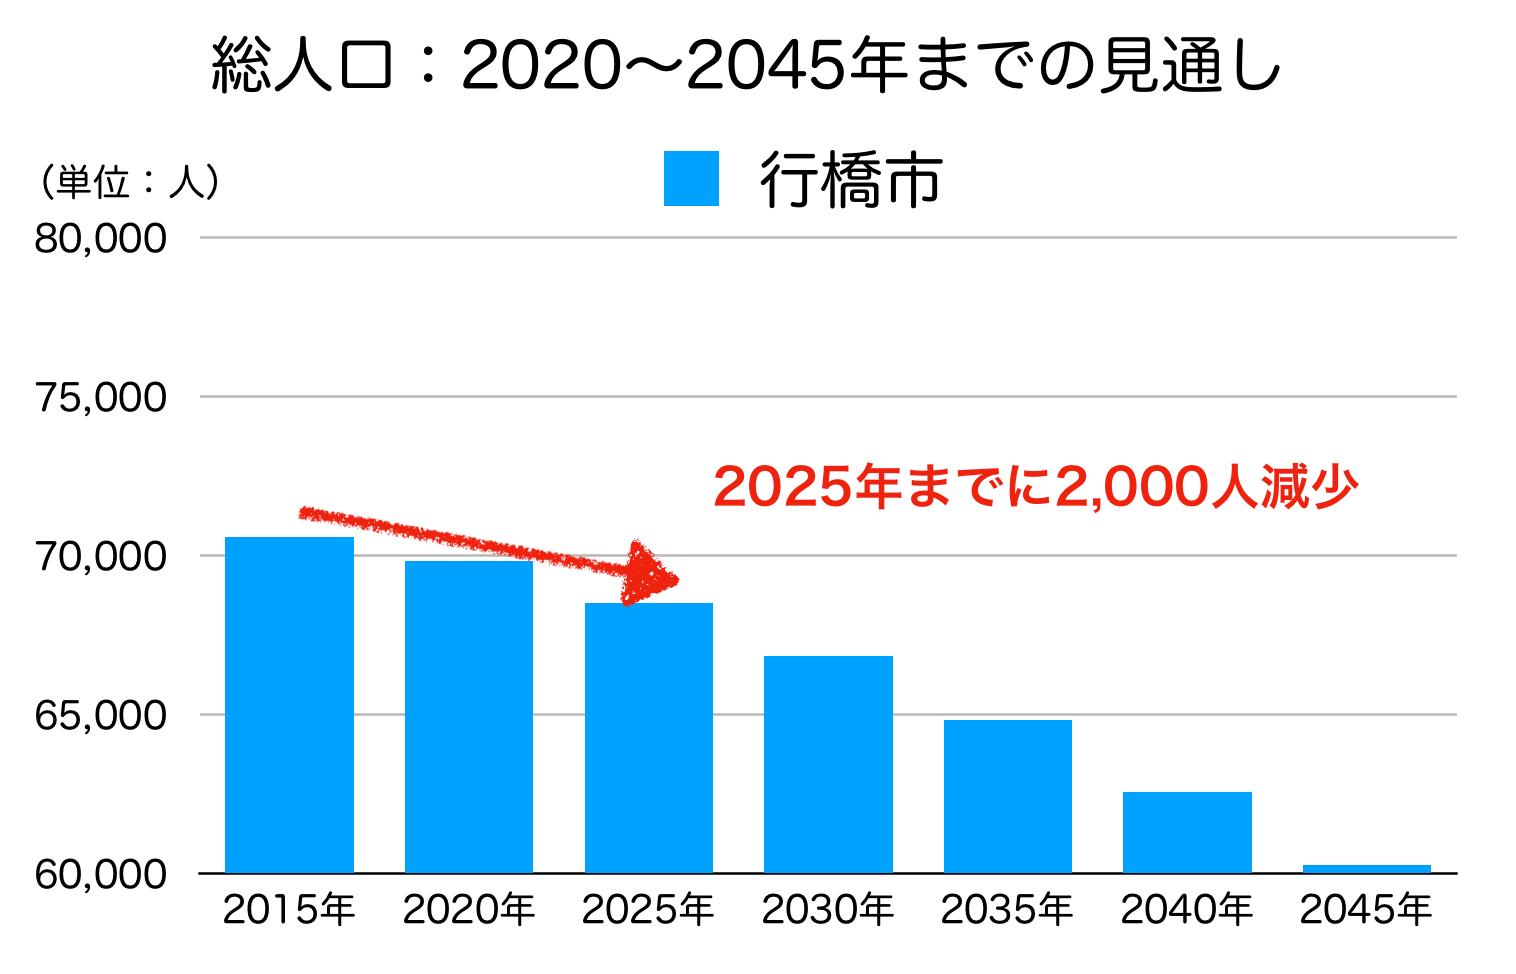 行橋市の人口予測